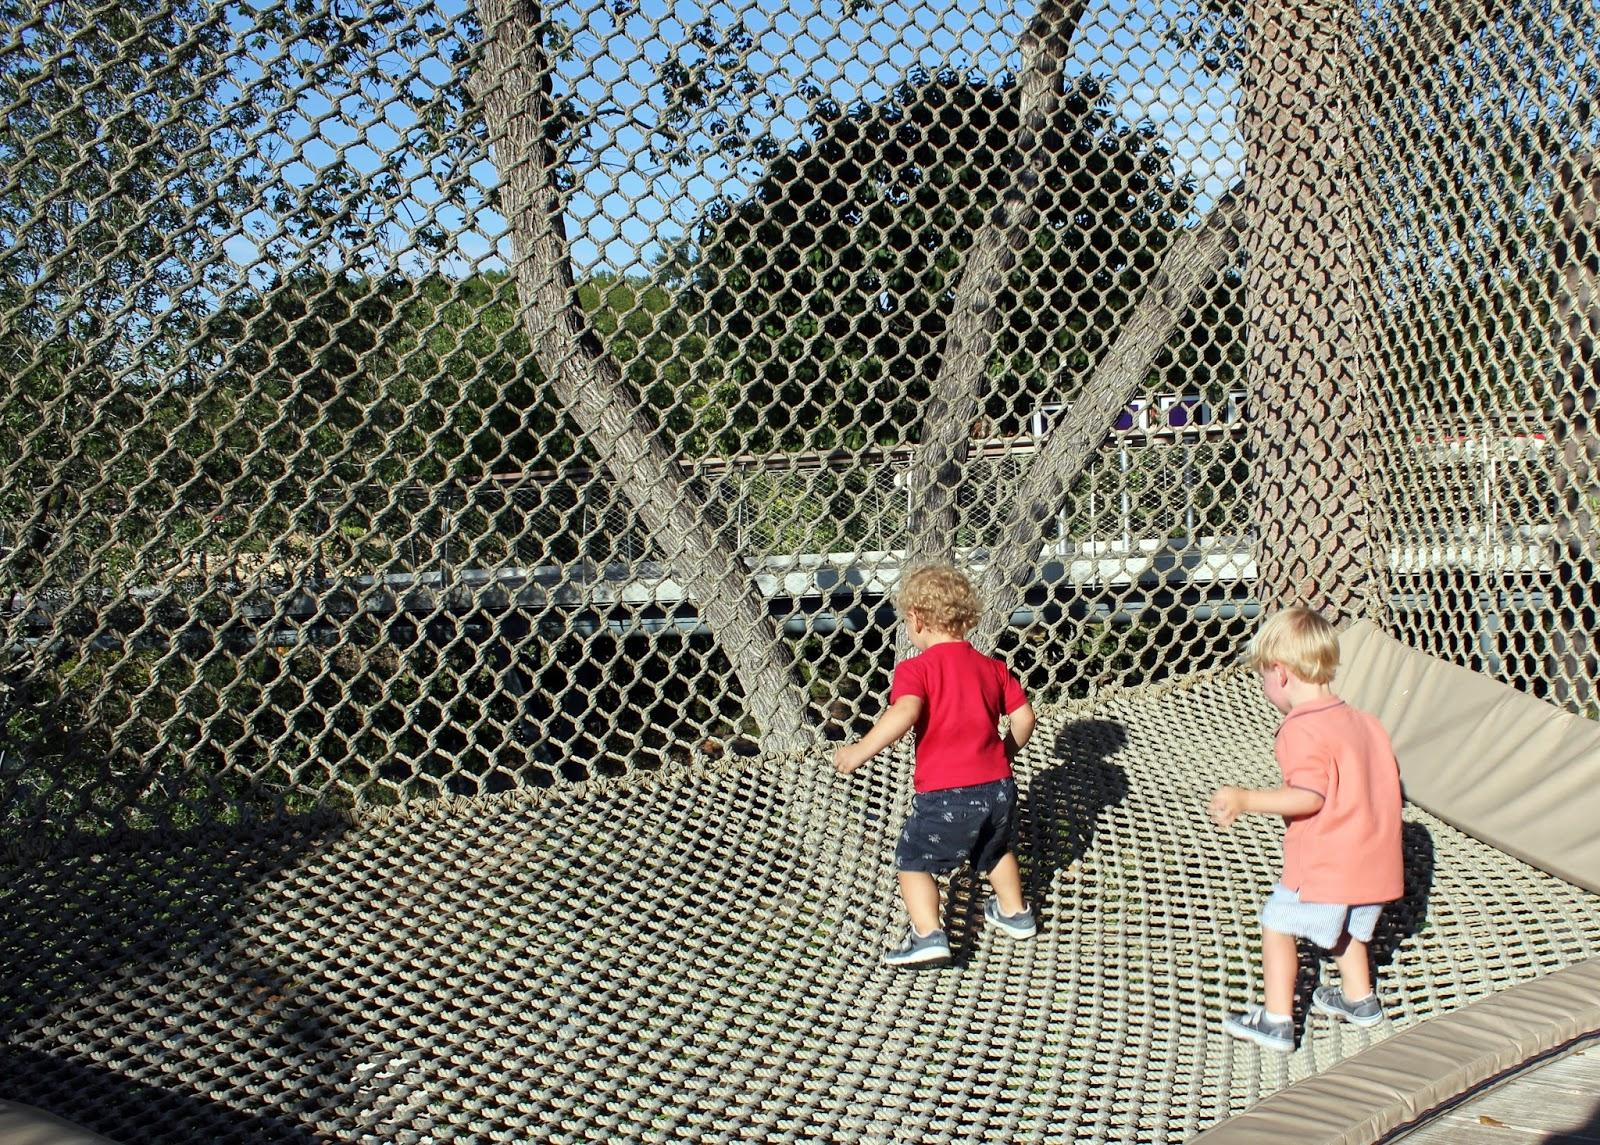 The Jordan Journeys Dallas Arboretum 39 S New Children 39 S Garden